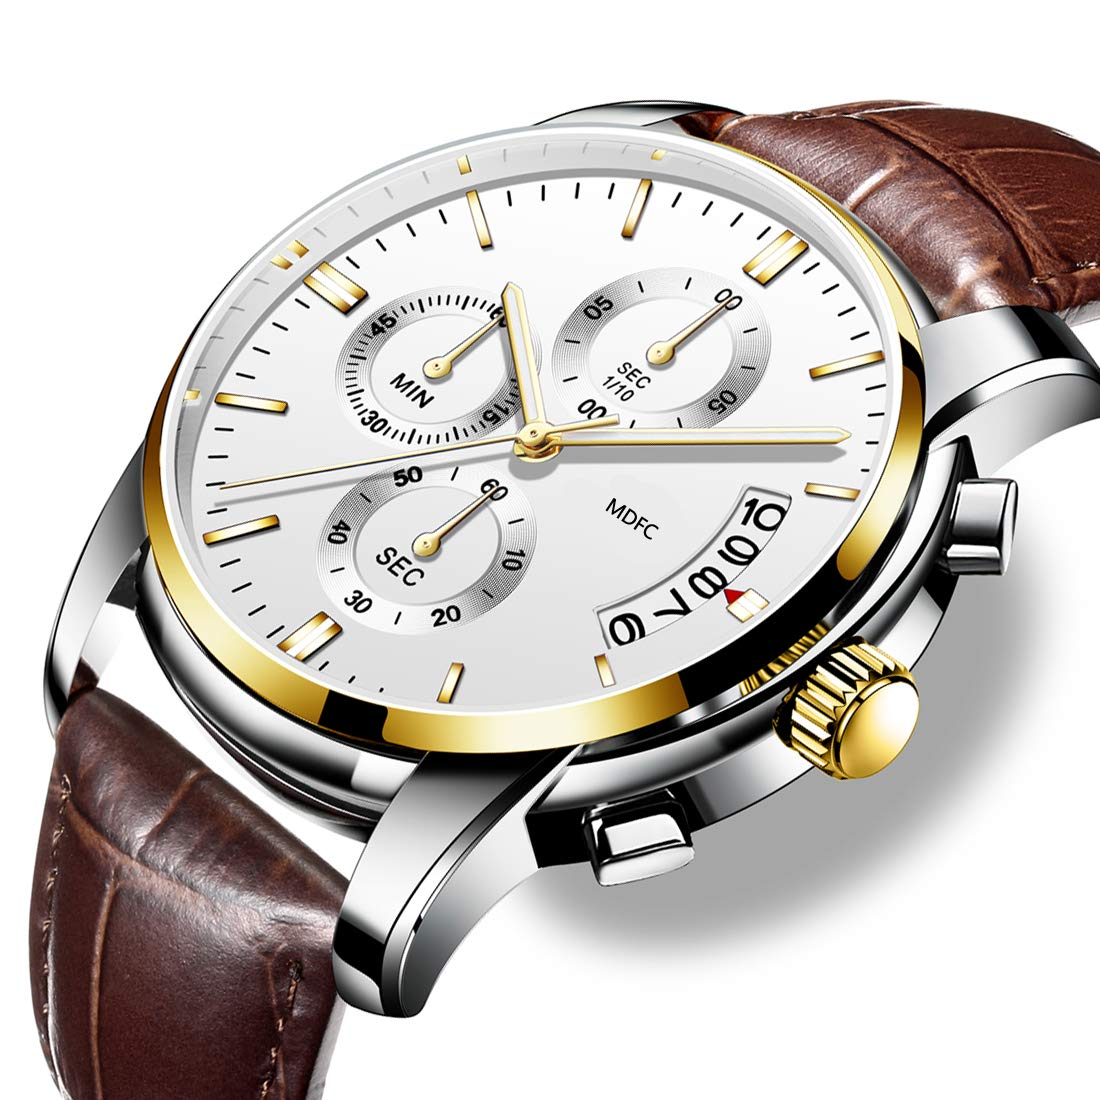 ec5b0709a435 Inicio   Ofertas   Relojes para Hombres